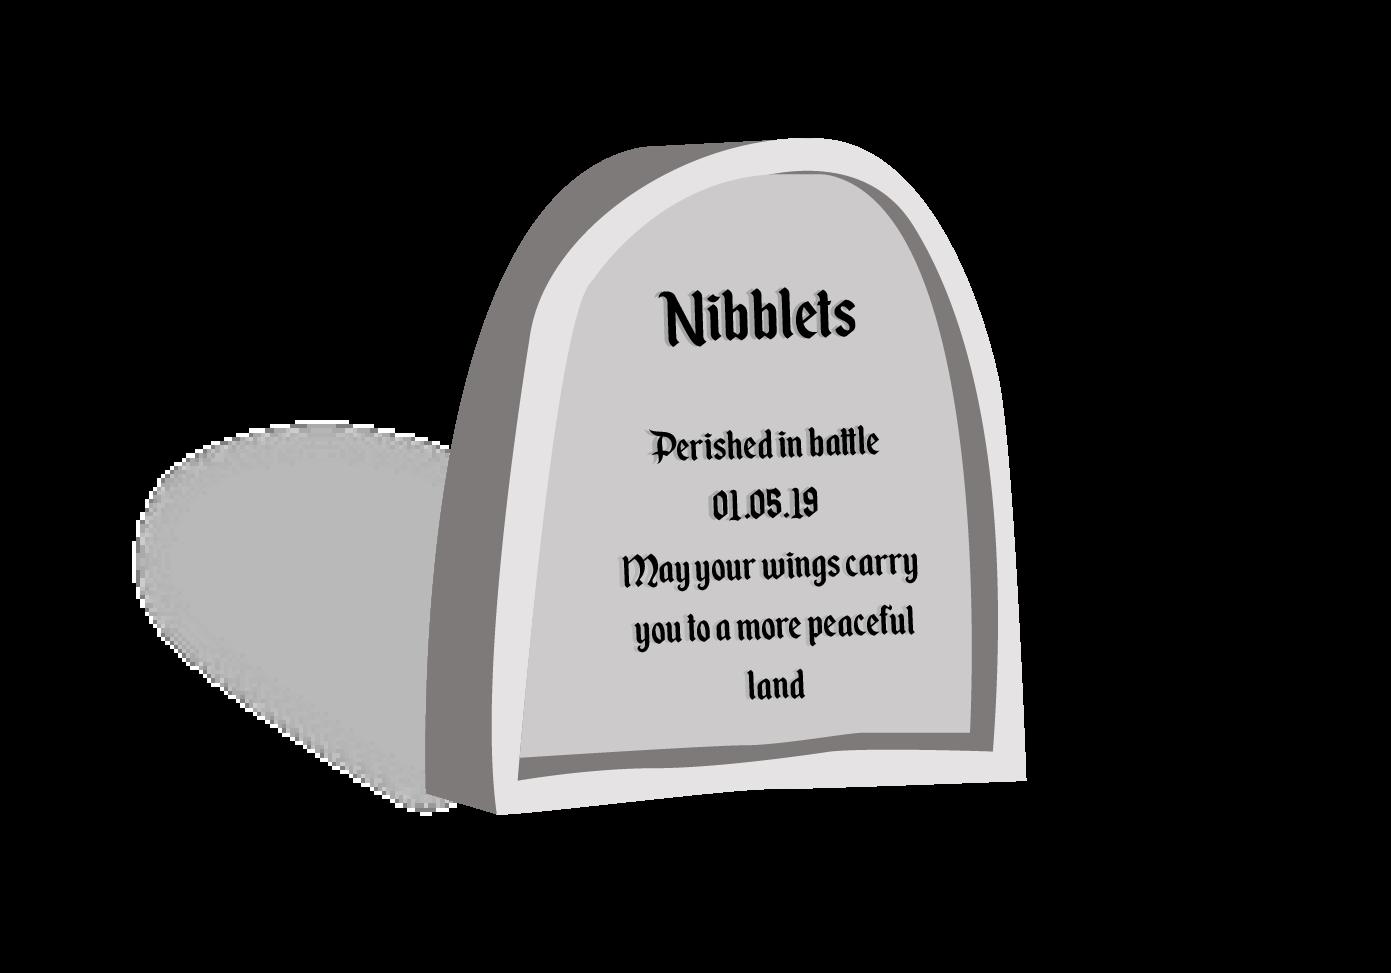 Nibblets2.png